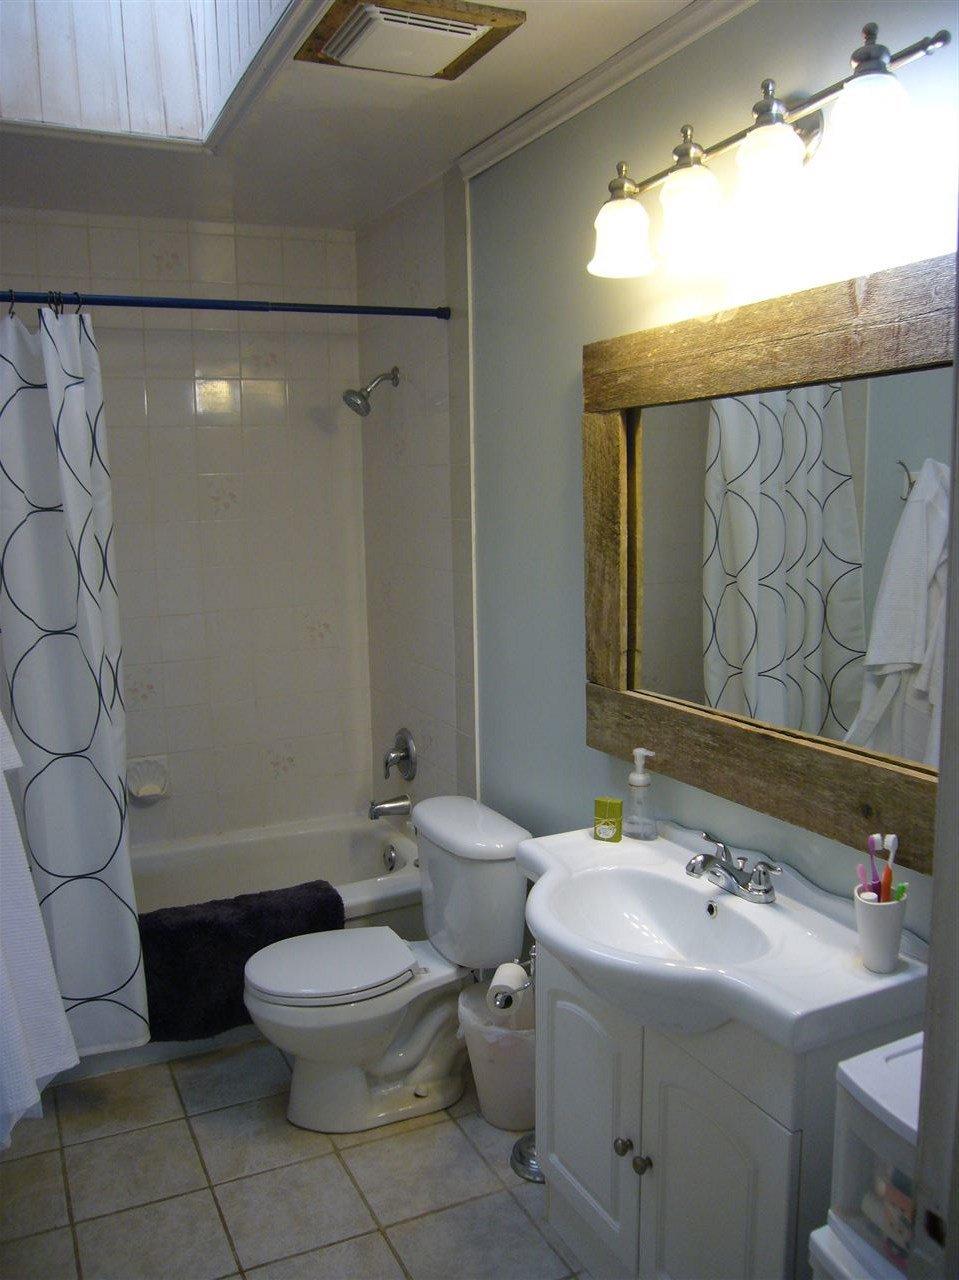 Photo 8: Photos: 6580 EVANS Road in Sardis: Sardis West Vedder Rd House for sale : MLS®# R2085581